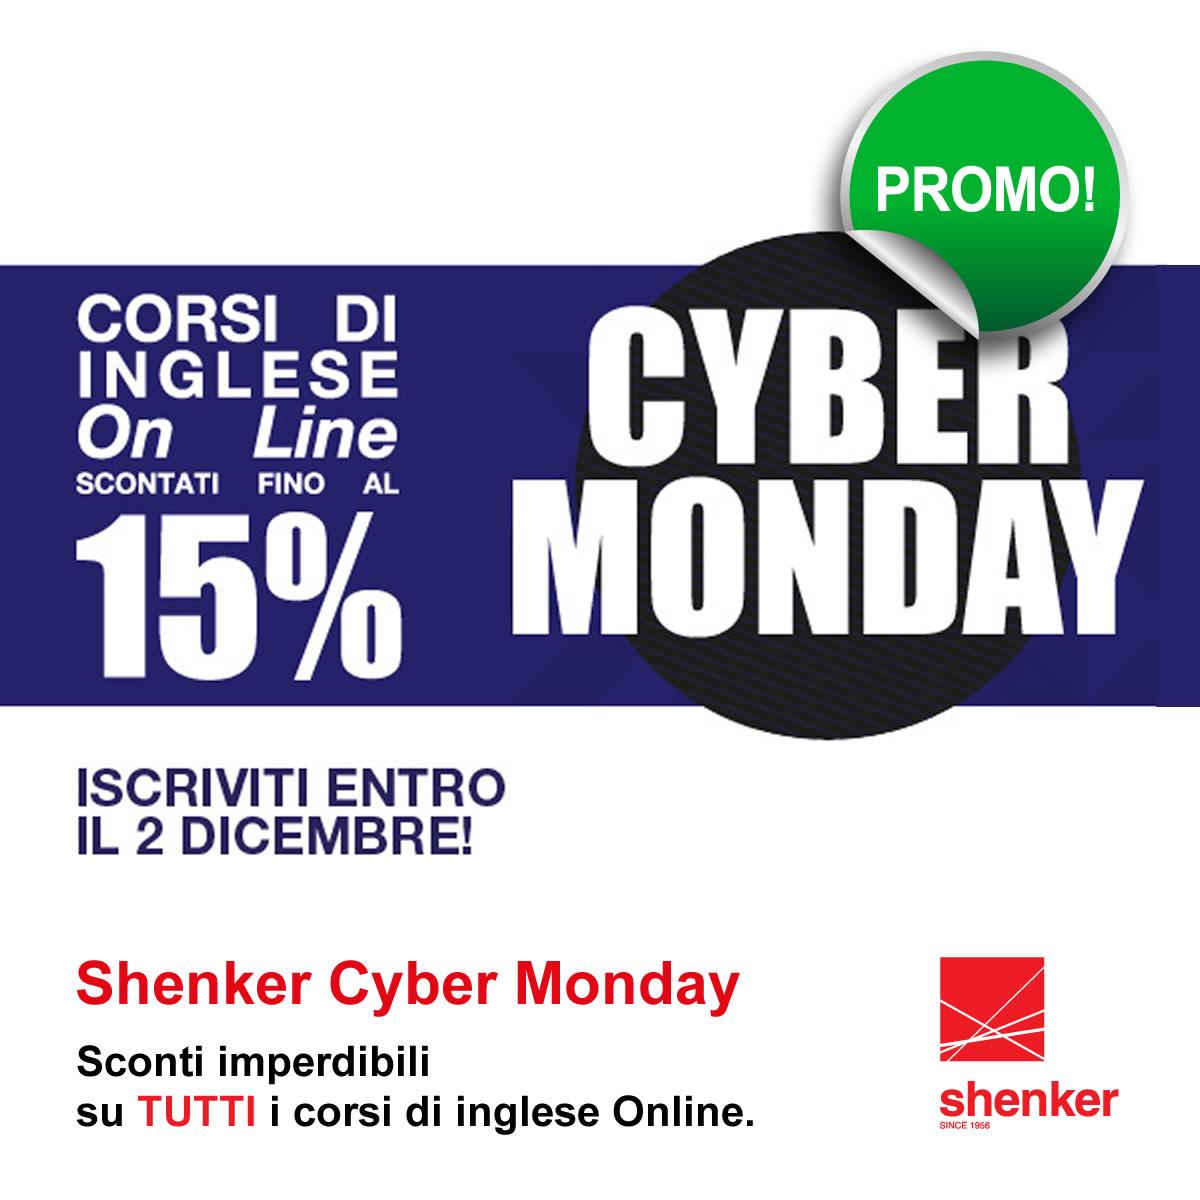 Shenker Cyber Monday 2019